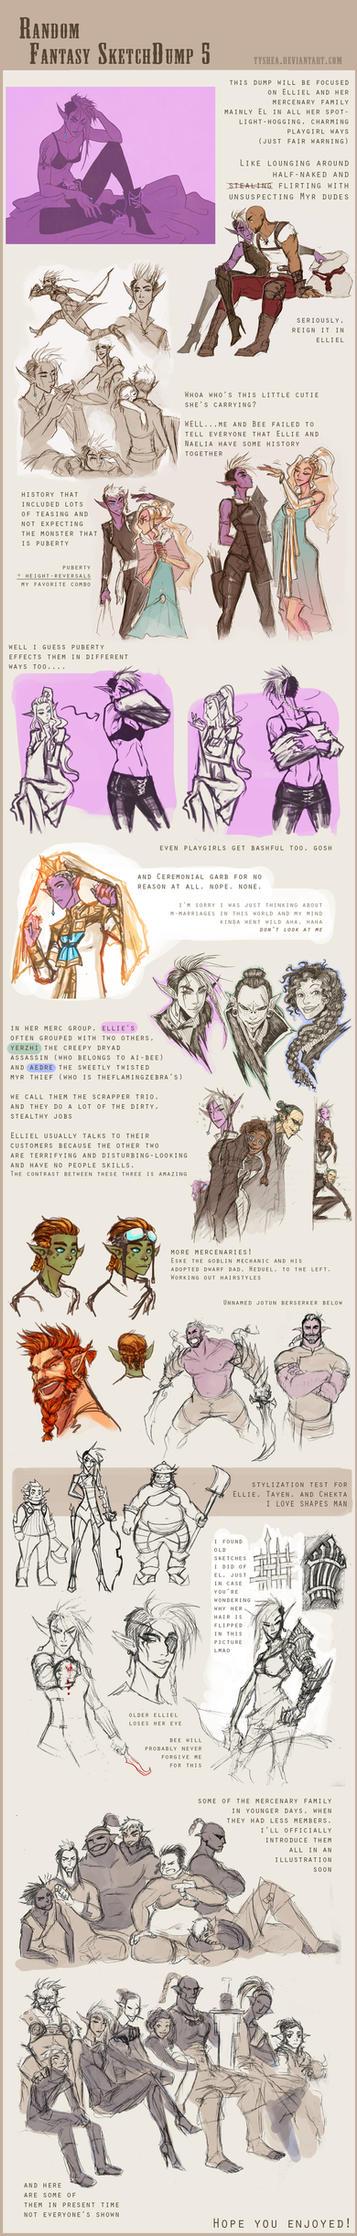 Fantasy Sketchdump 5 by Dyemelikeasunset